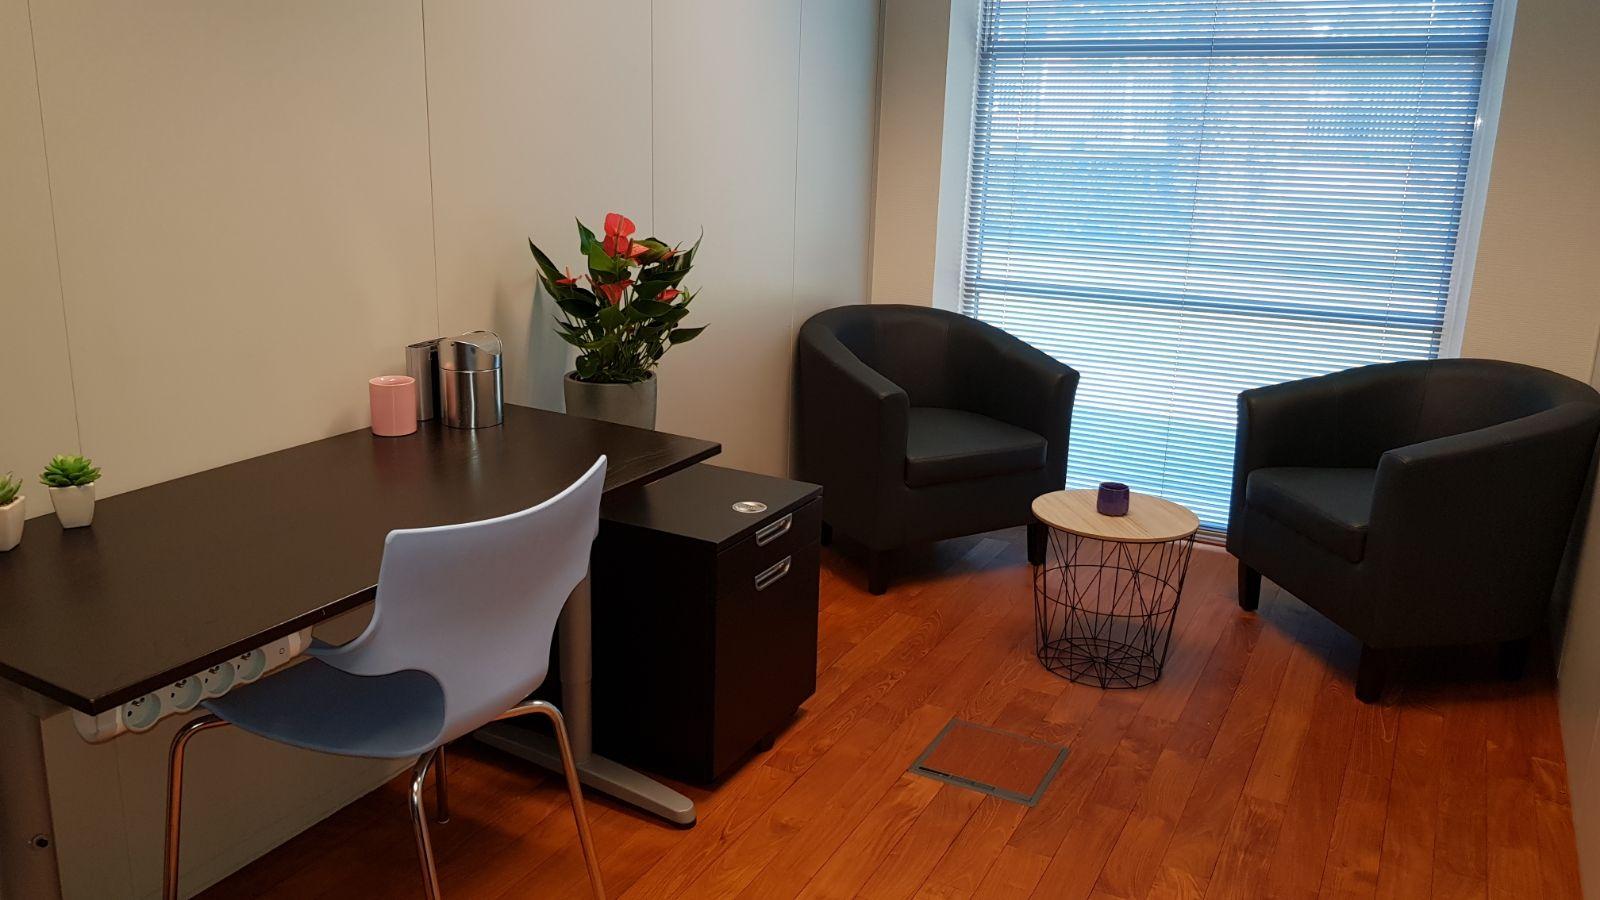 Psycholoog psychotherapeut Leuven Praktijk depressie adhd stress Haasrode psychologen psychologenpraktijk groepspraktijk gedragstherapeut